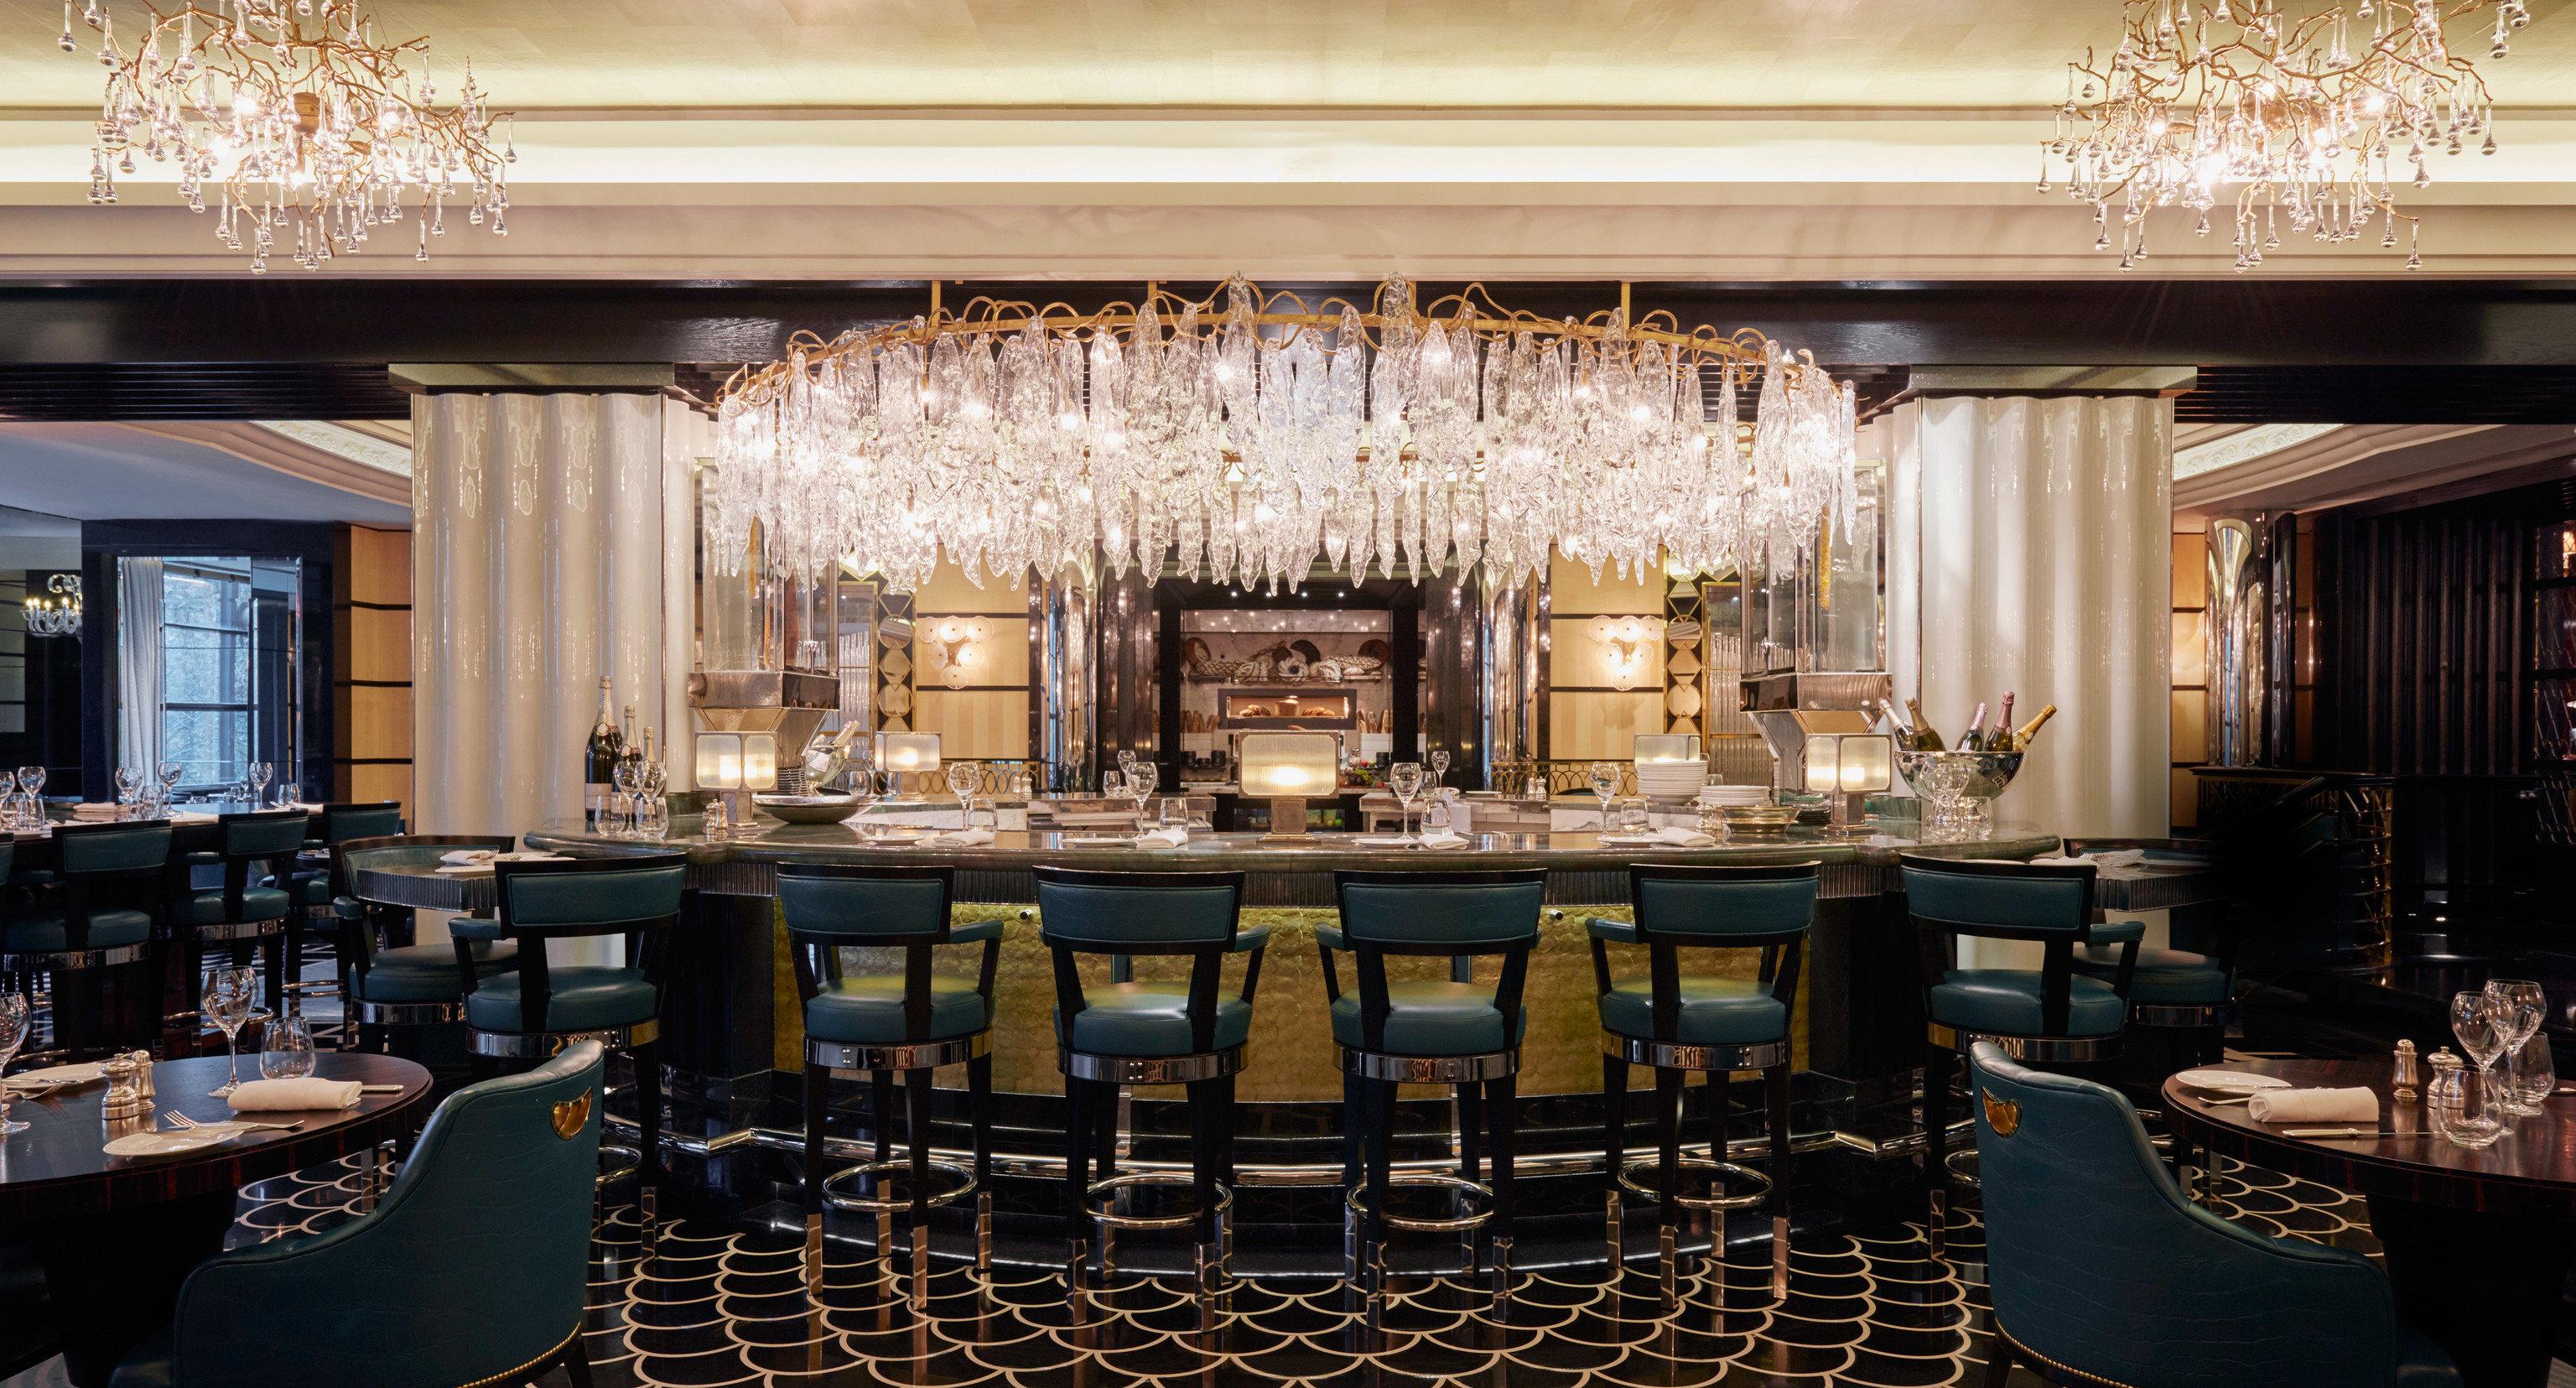 Hotels London Luxury Travel chair function hall Lobby restaurant ballroom living room